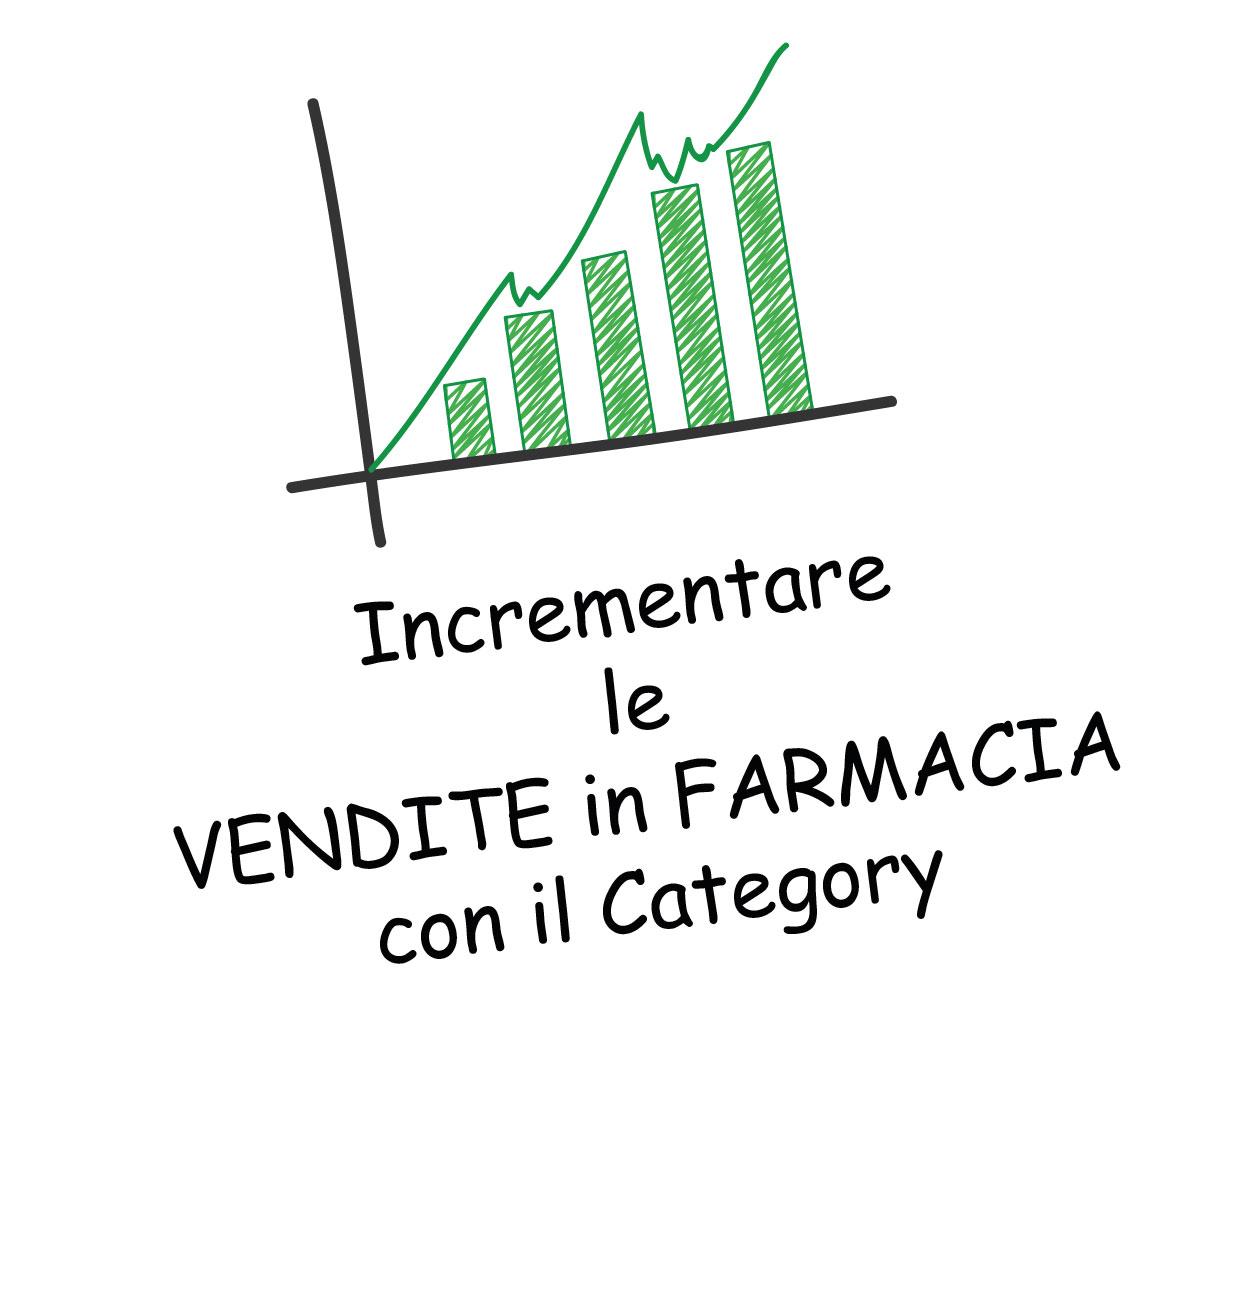 category in farmacia